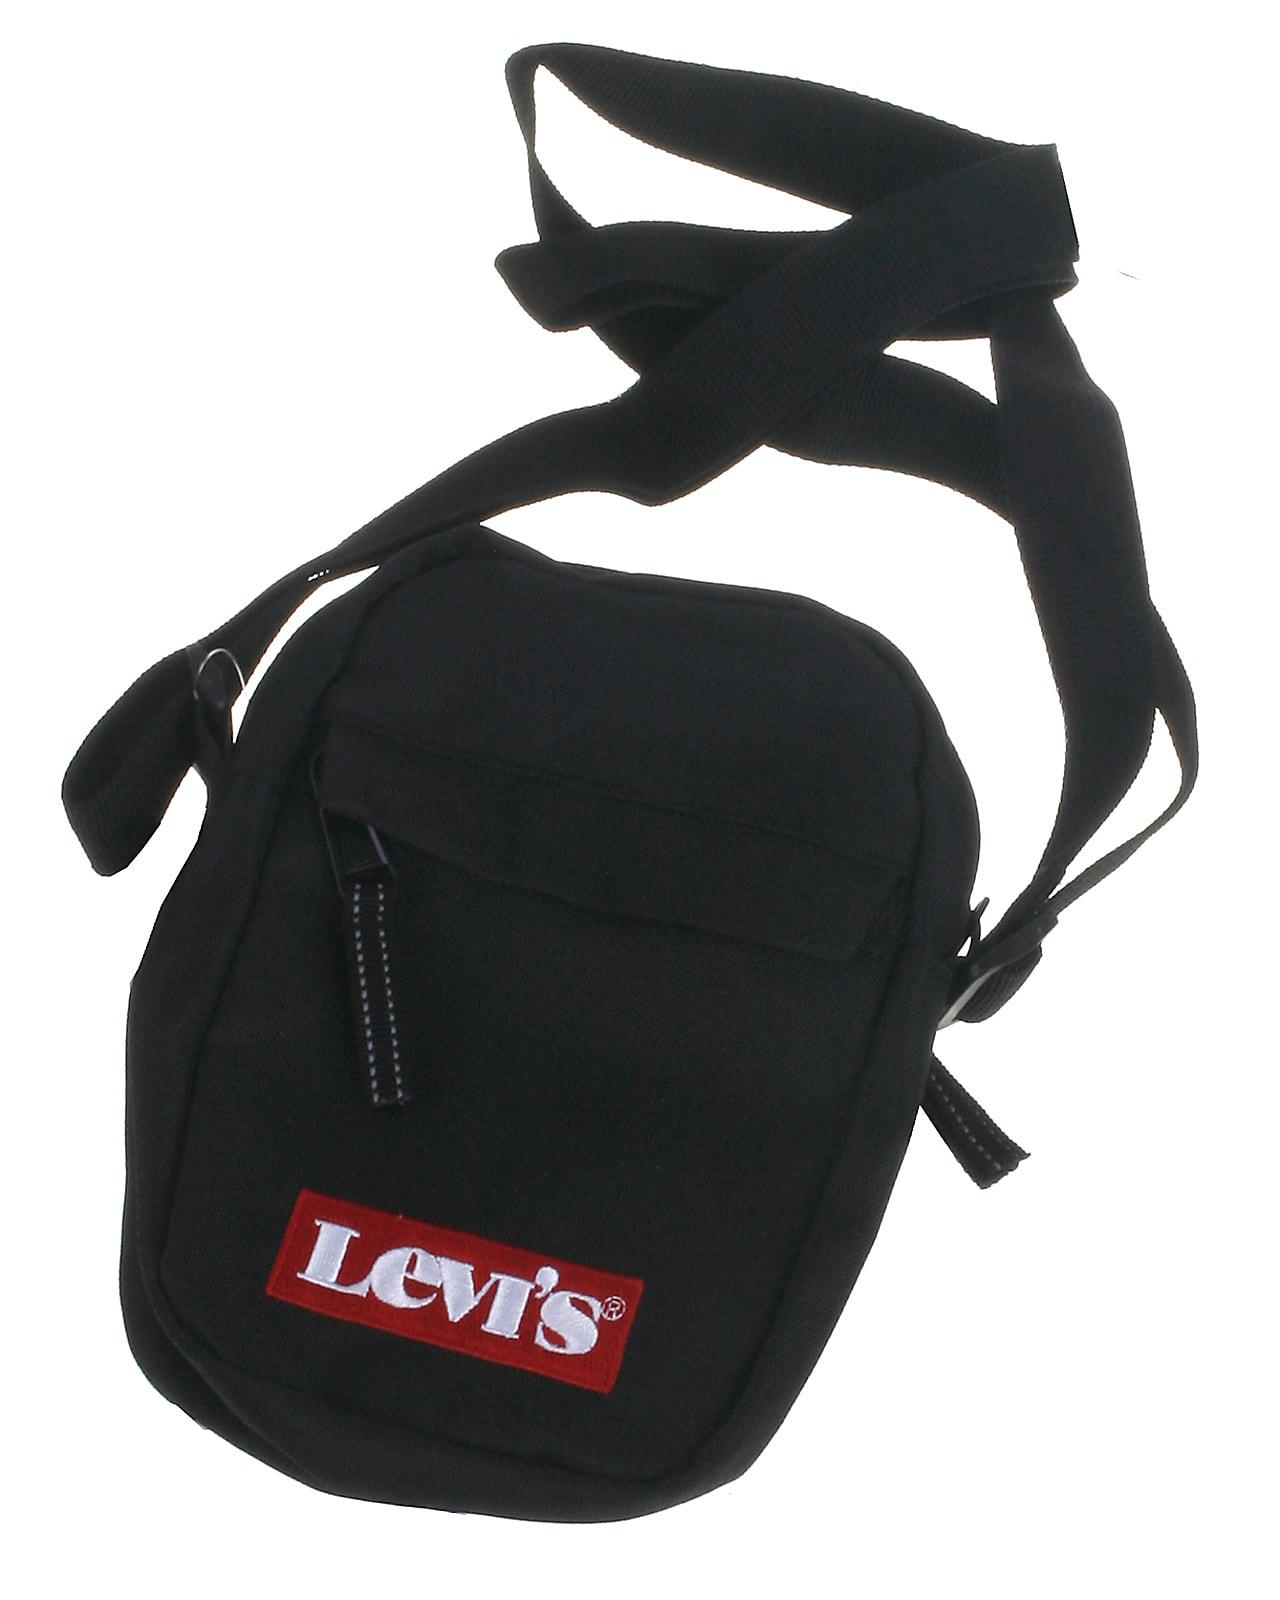 Image of Levis cross bag, Festival, black